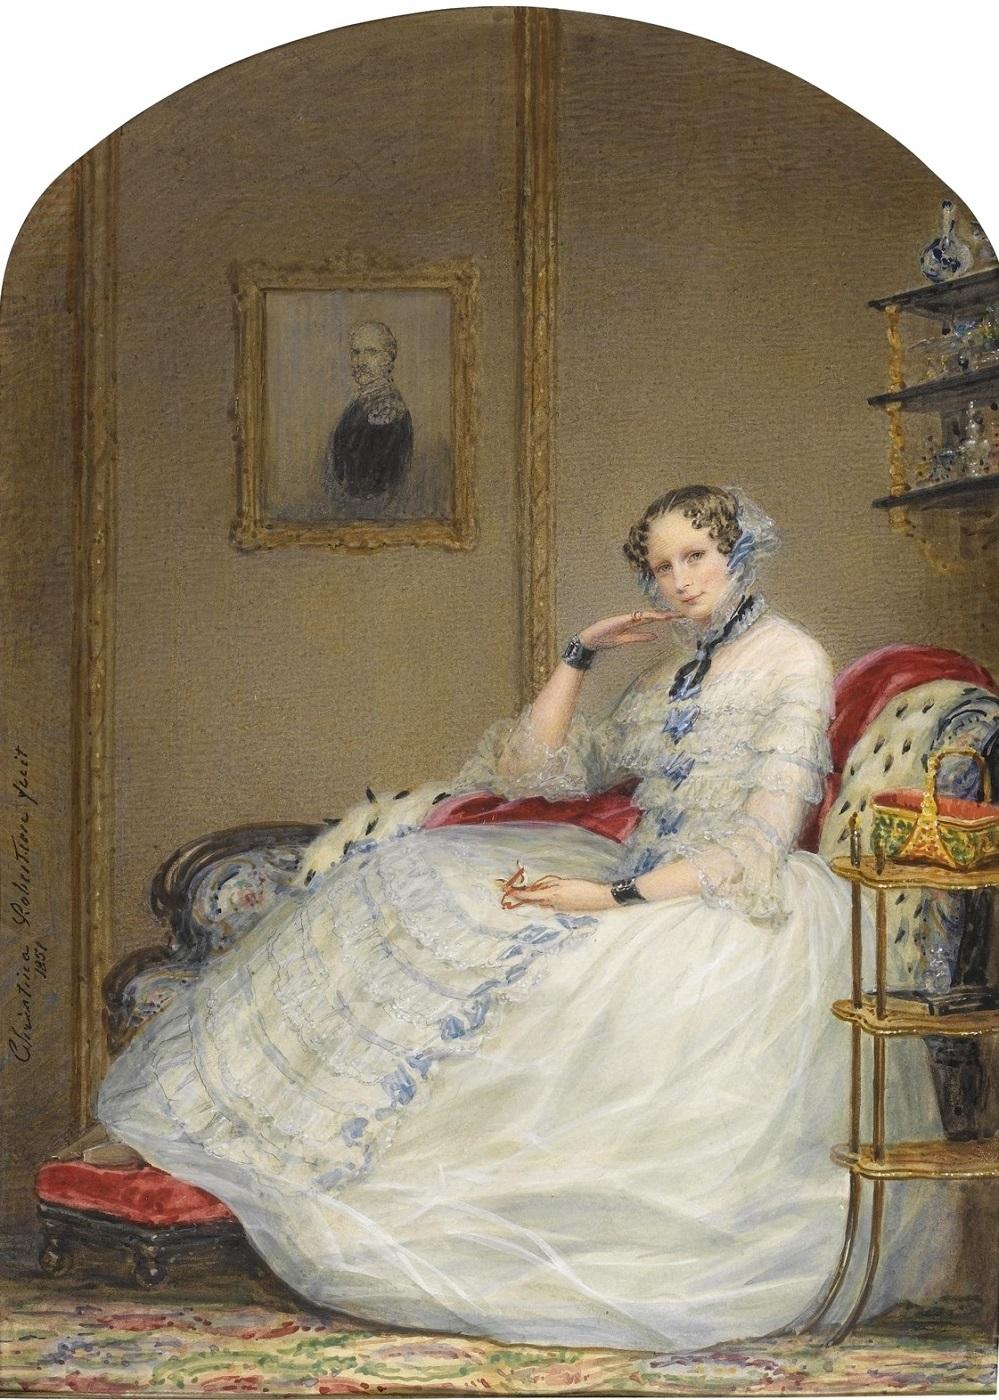 1851 Императрица Александра Федоровна (Empress Alexandra Fedorovna) Частное собрание